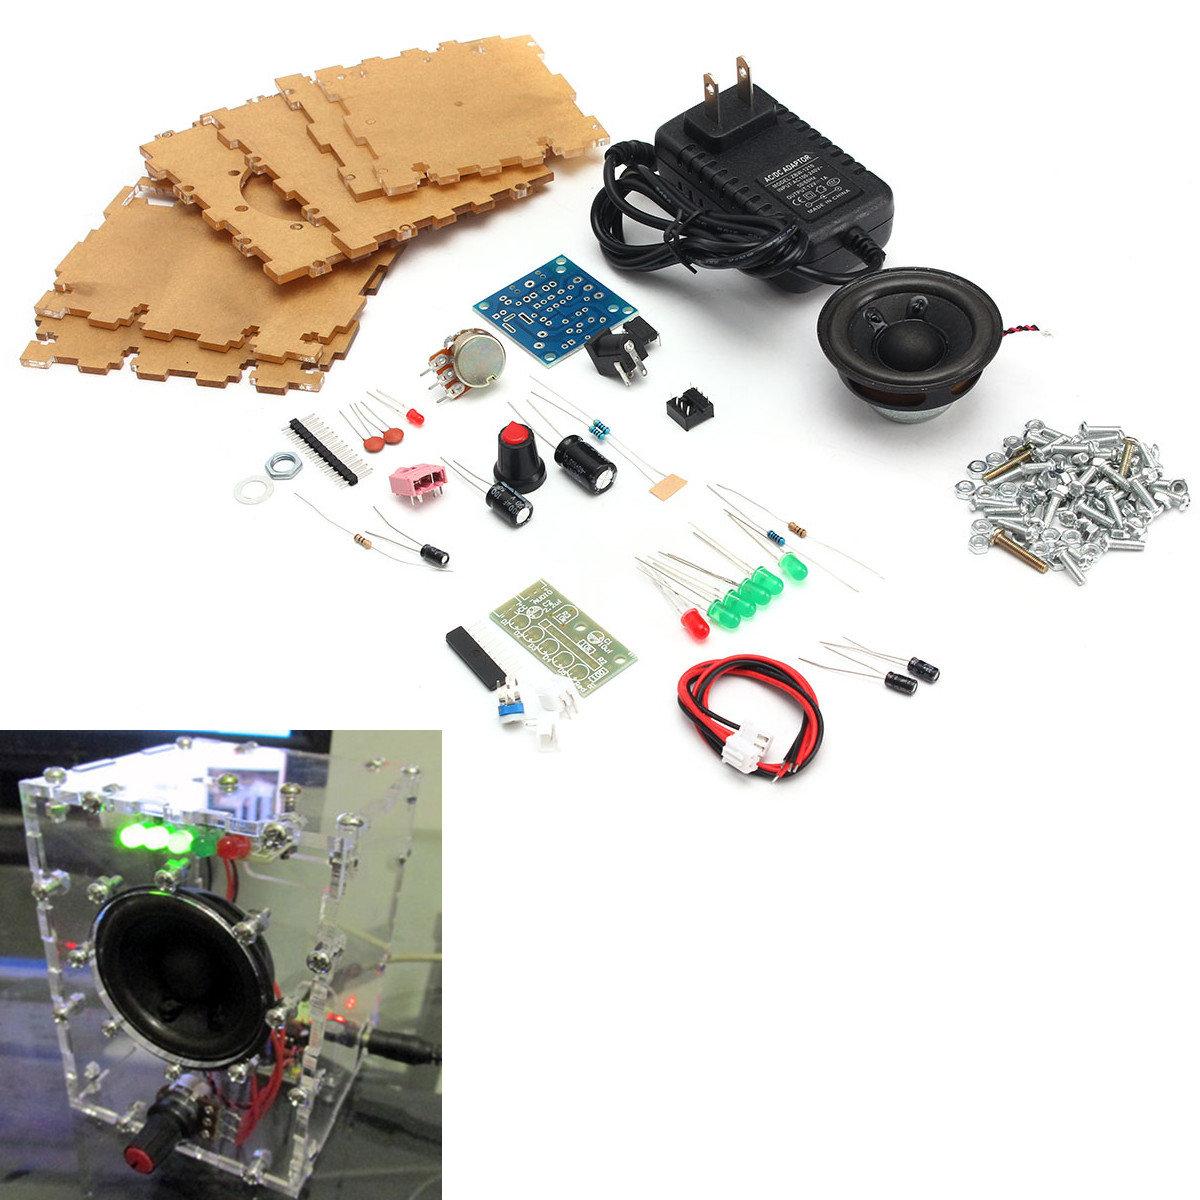 Diy Lm386 Amplifier Speaker Kit With Clear Box Transparent Case Sale Intercom Circuit Using Ic Diagram